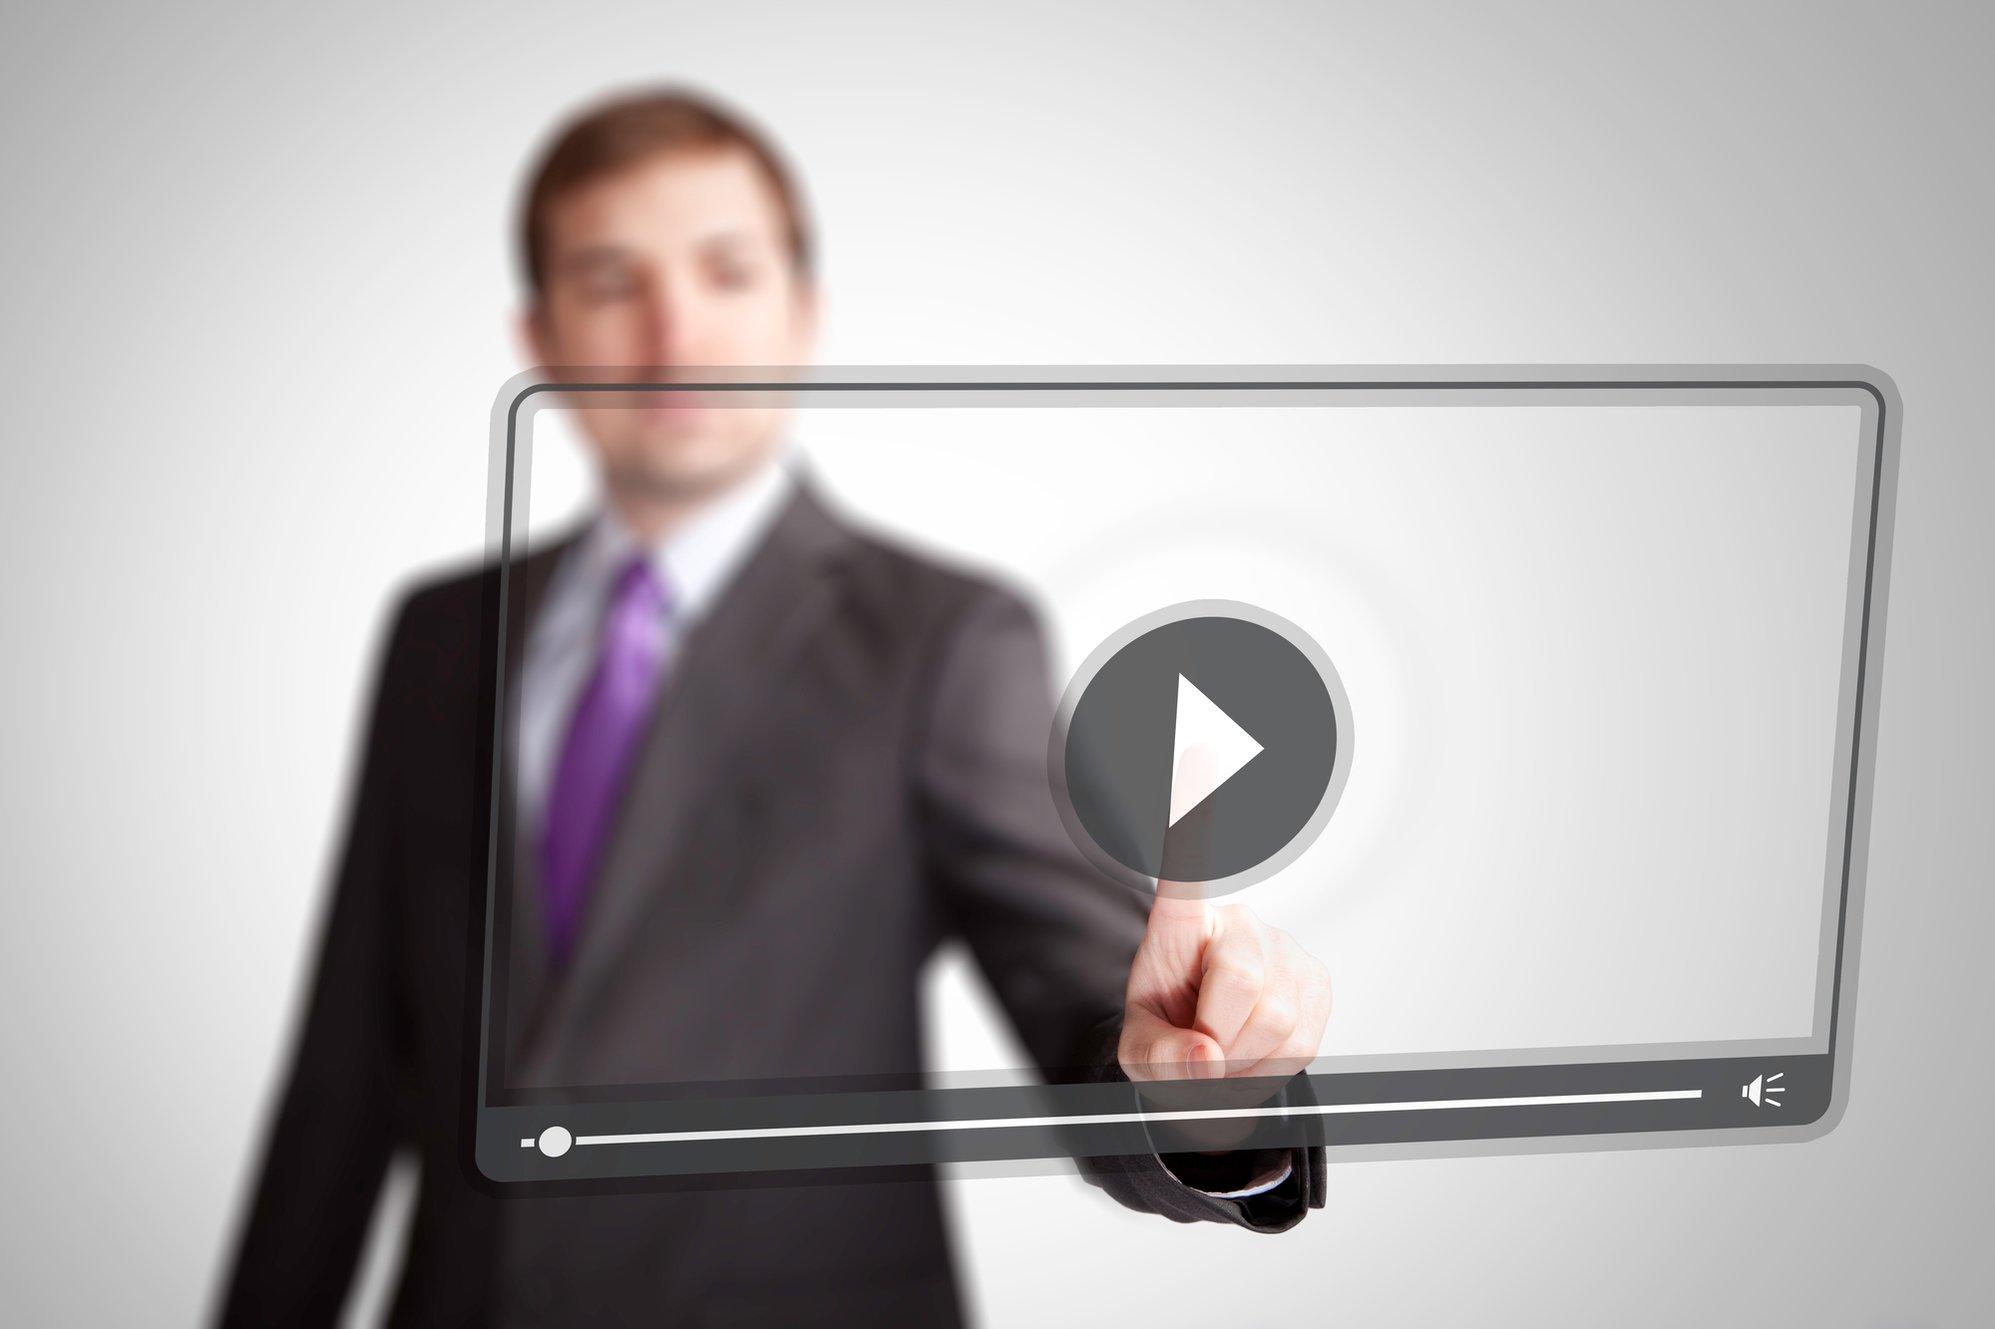 Press video play button